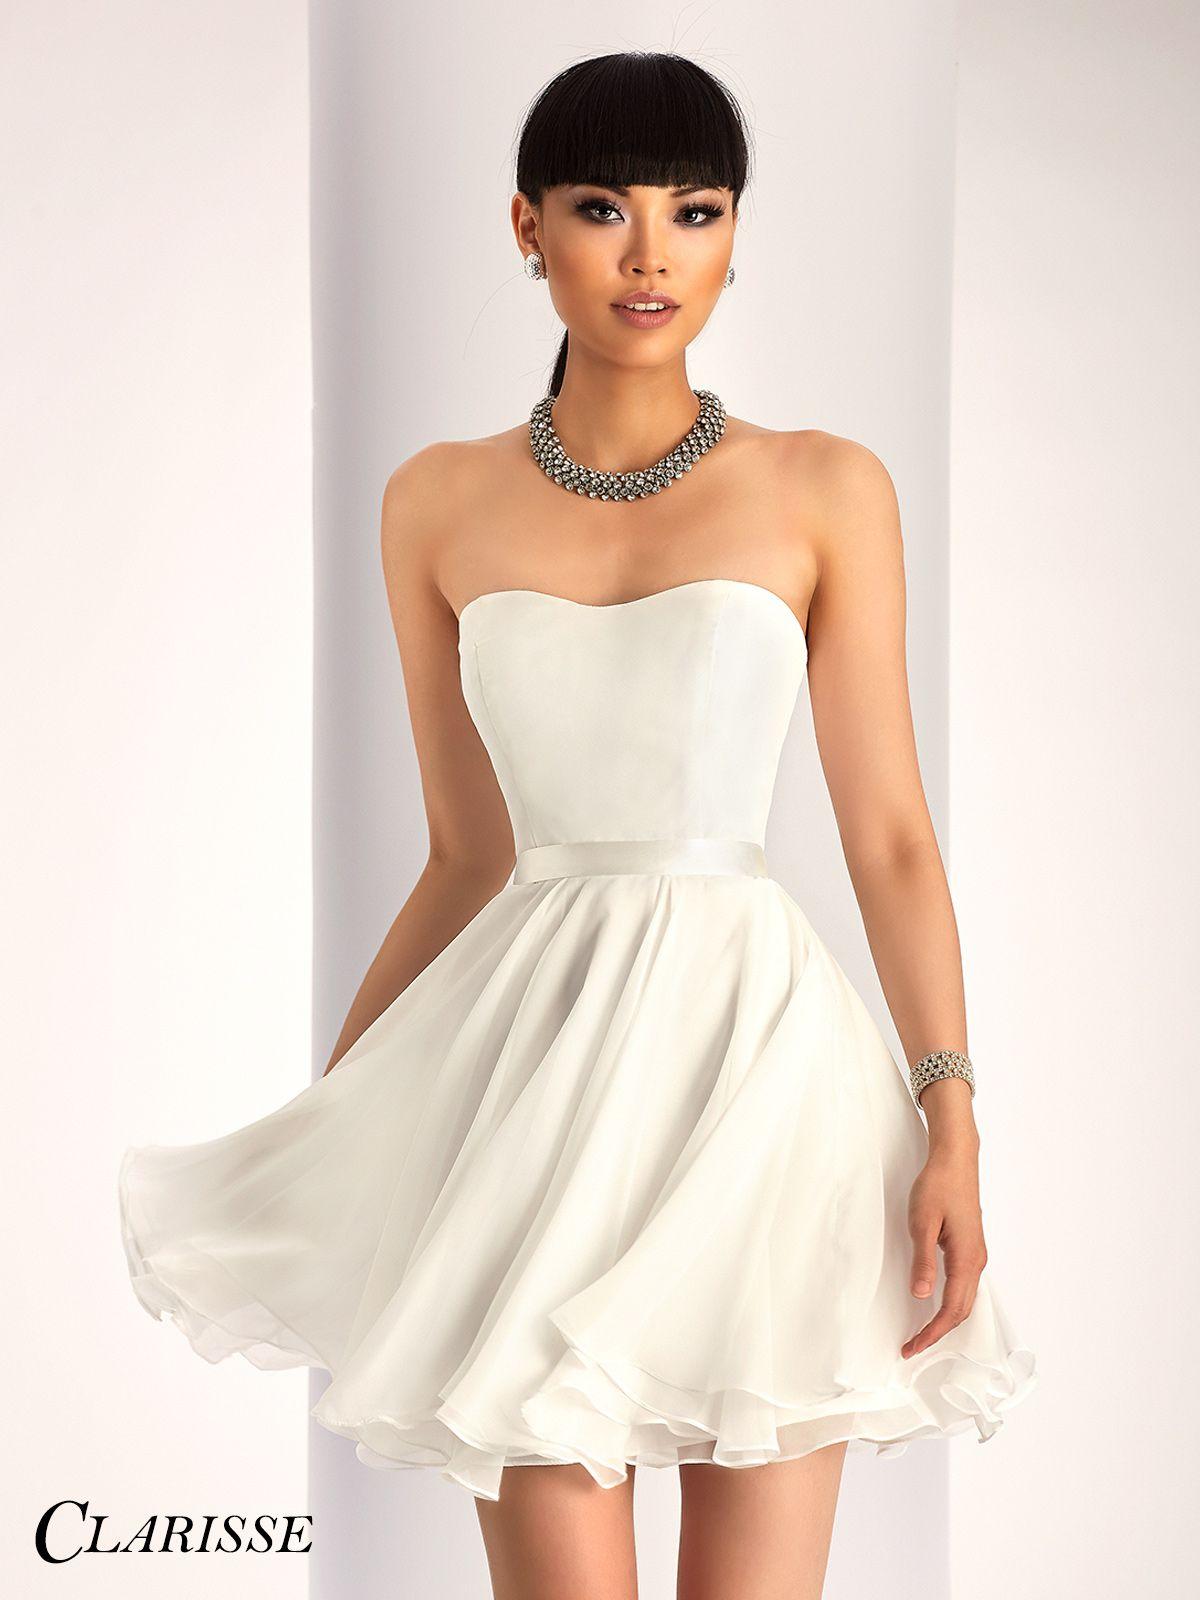 Clarisse Short Formal Dress 3215 - Formal dresses- Homecoming ...